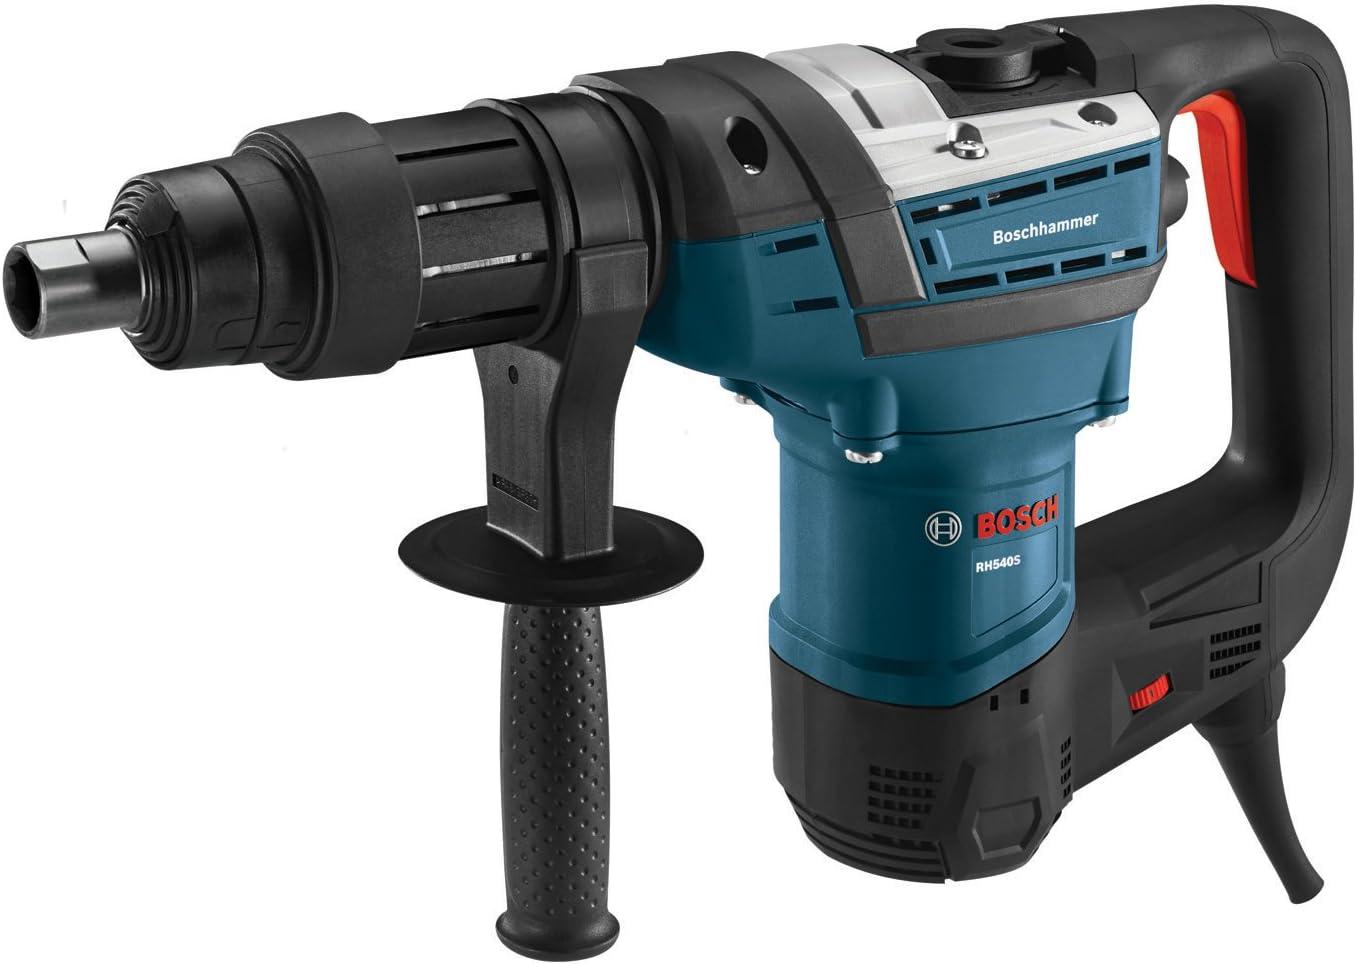 Bosch RH540S 1-9/16-Inch Spline Combination Rotary Hammer